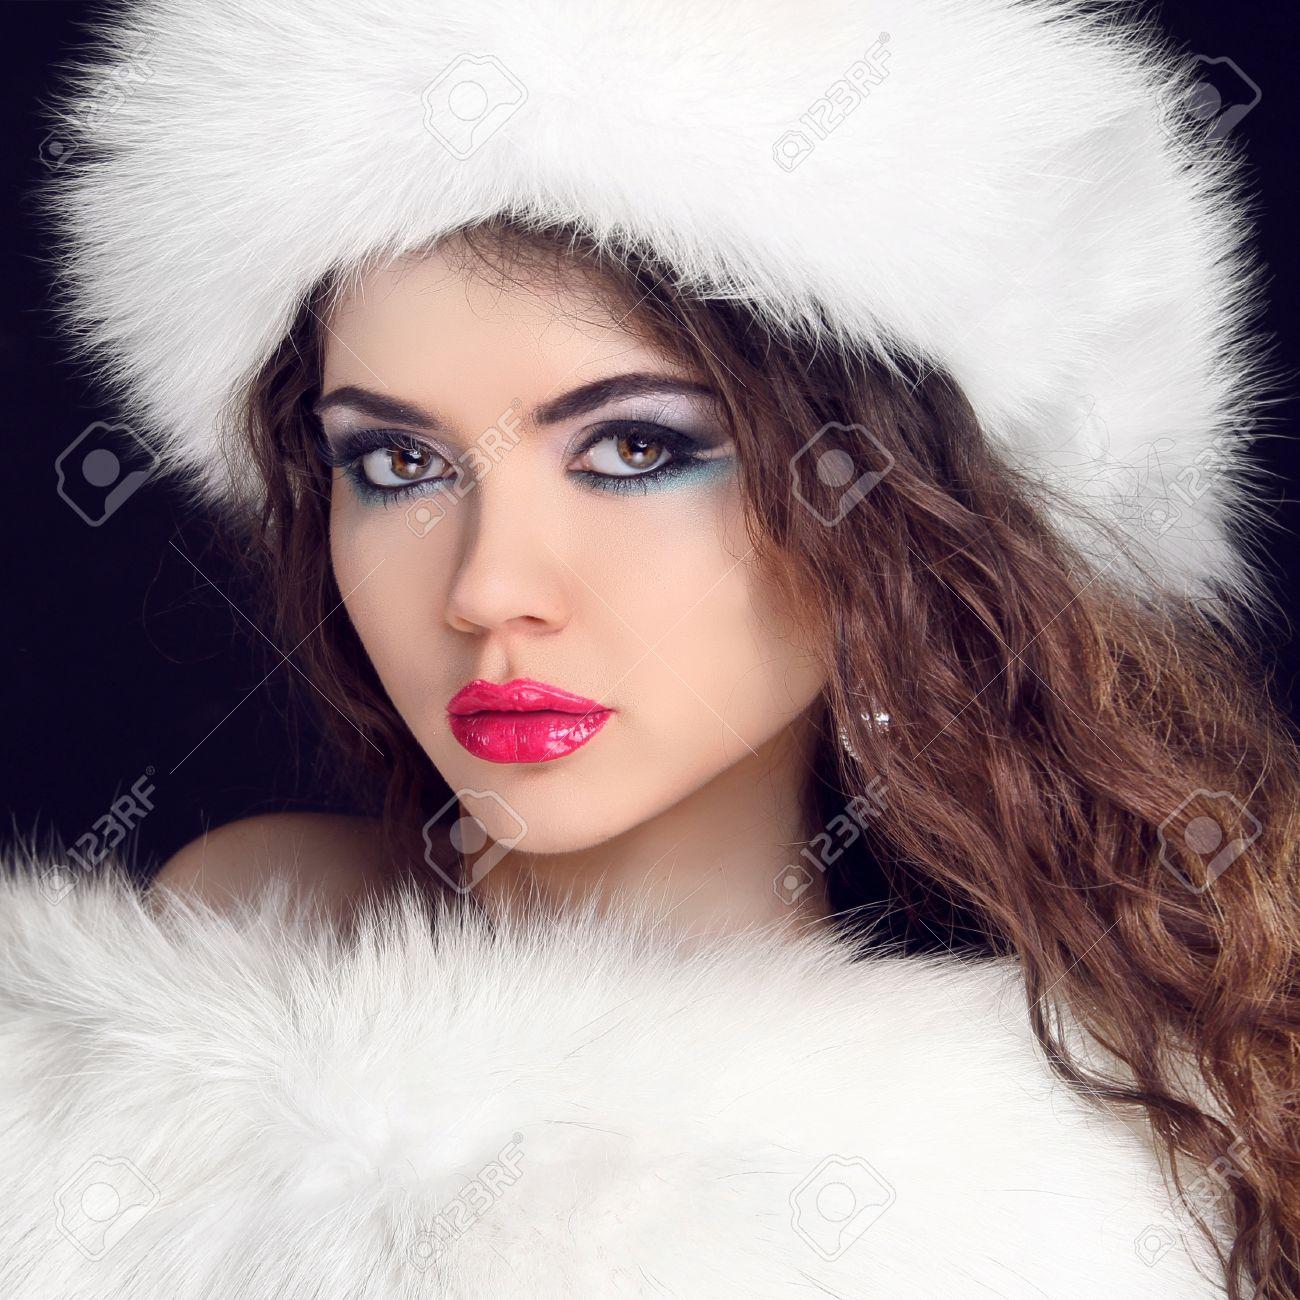 Fur Fashion. Beautiful Girl in Furry Hat. Winter Woman Portrait Stock Photo - 20581339